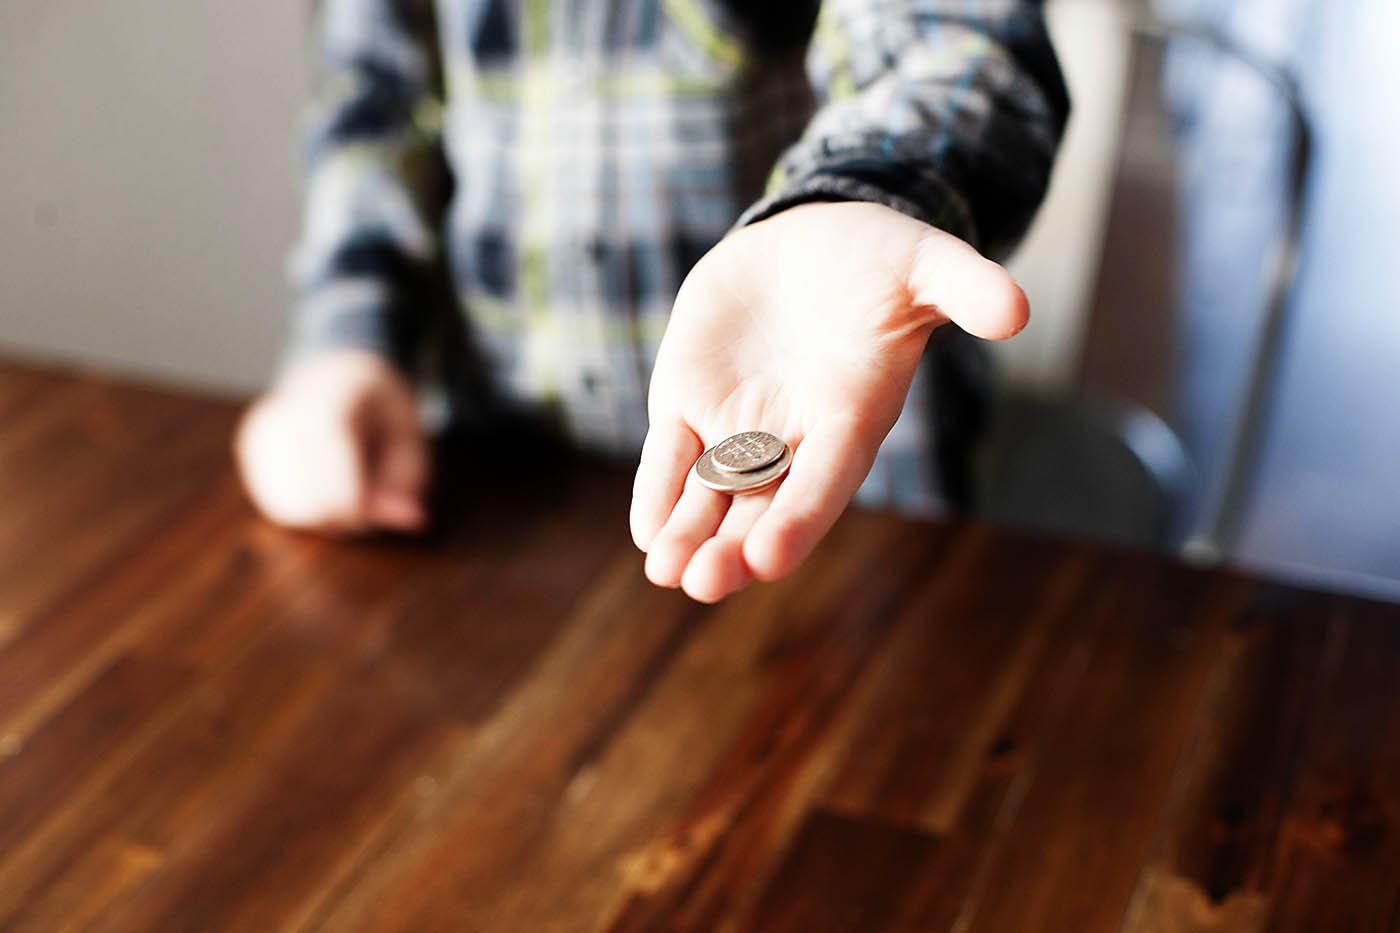 aftb-easy-coin-trick-3